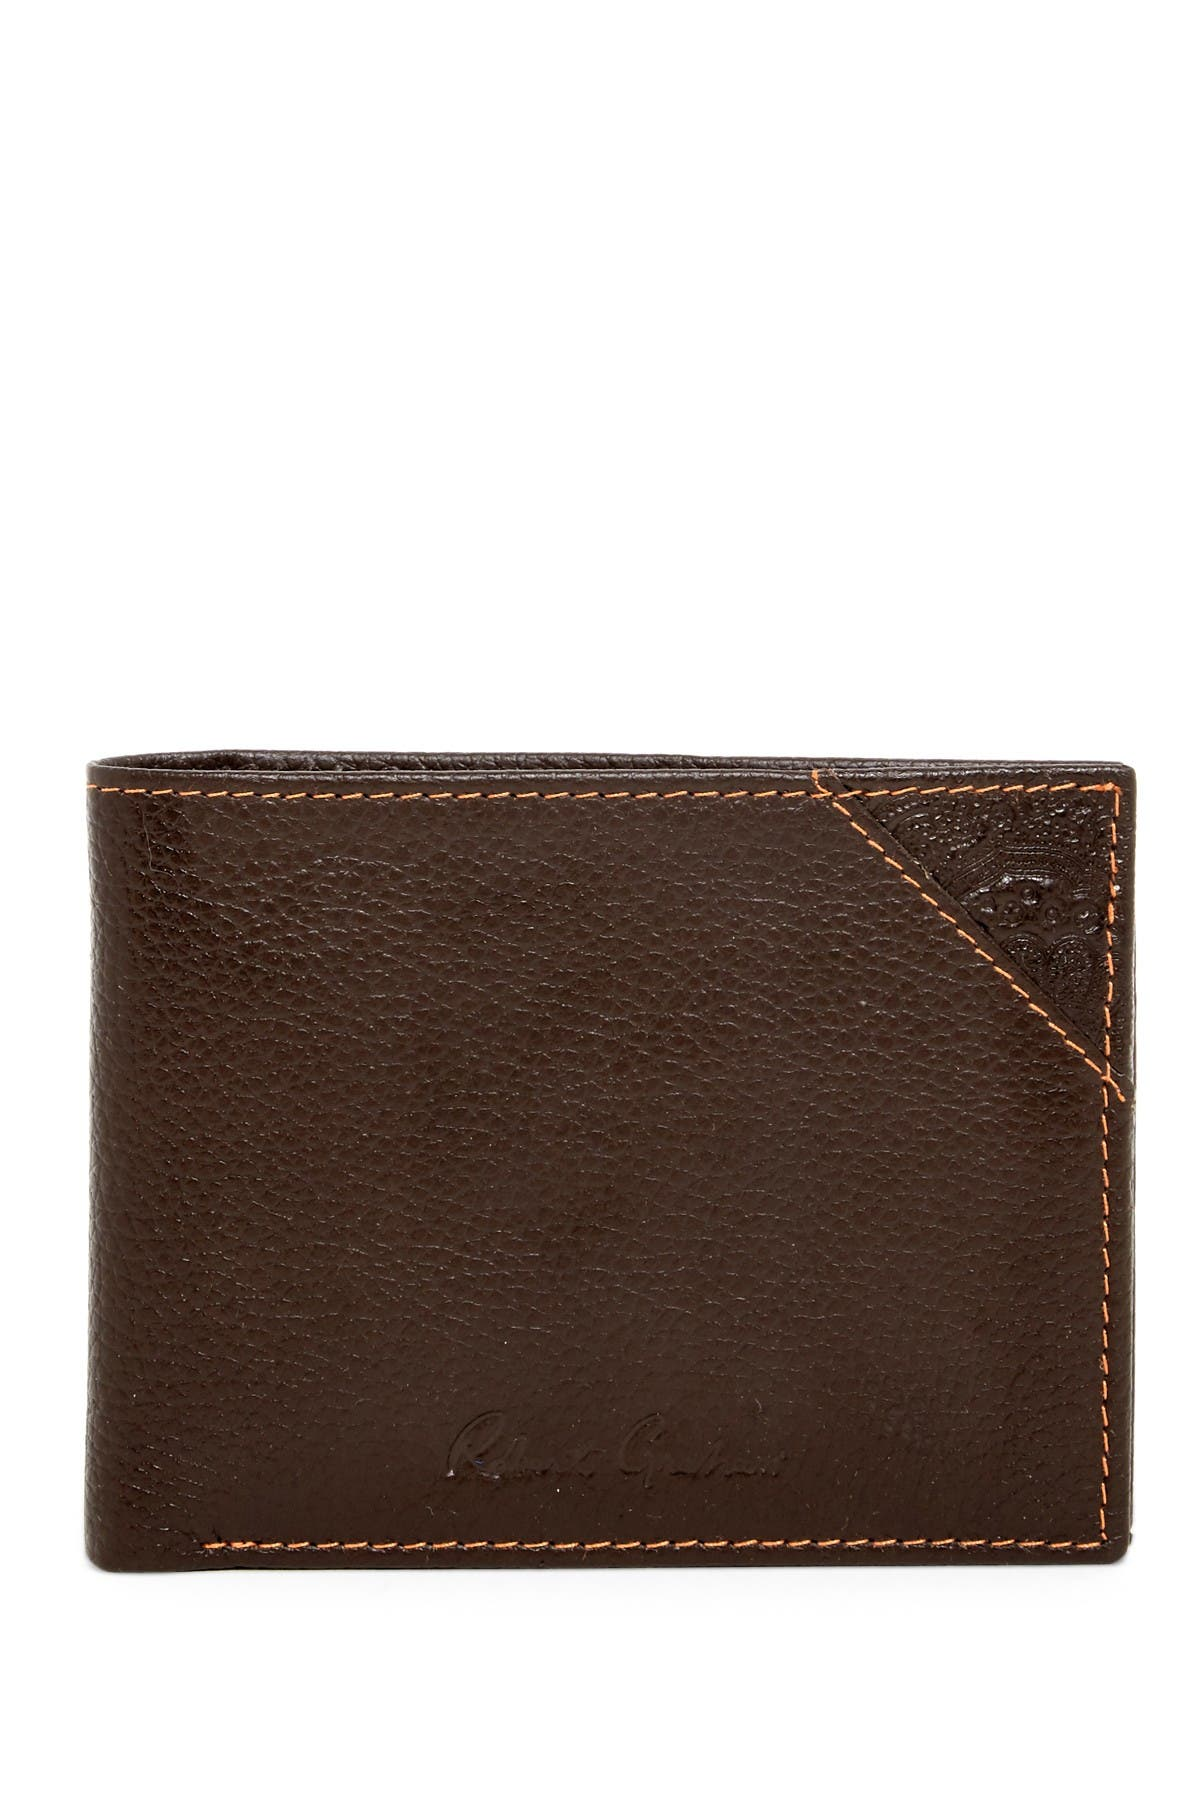 Image of Robert Graham Pledge Leather Bifold Wallet